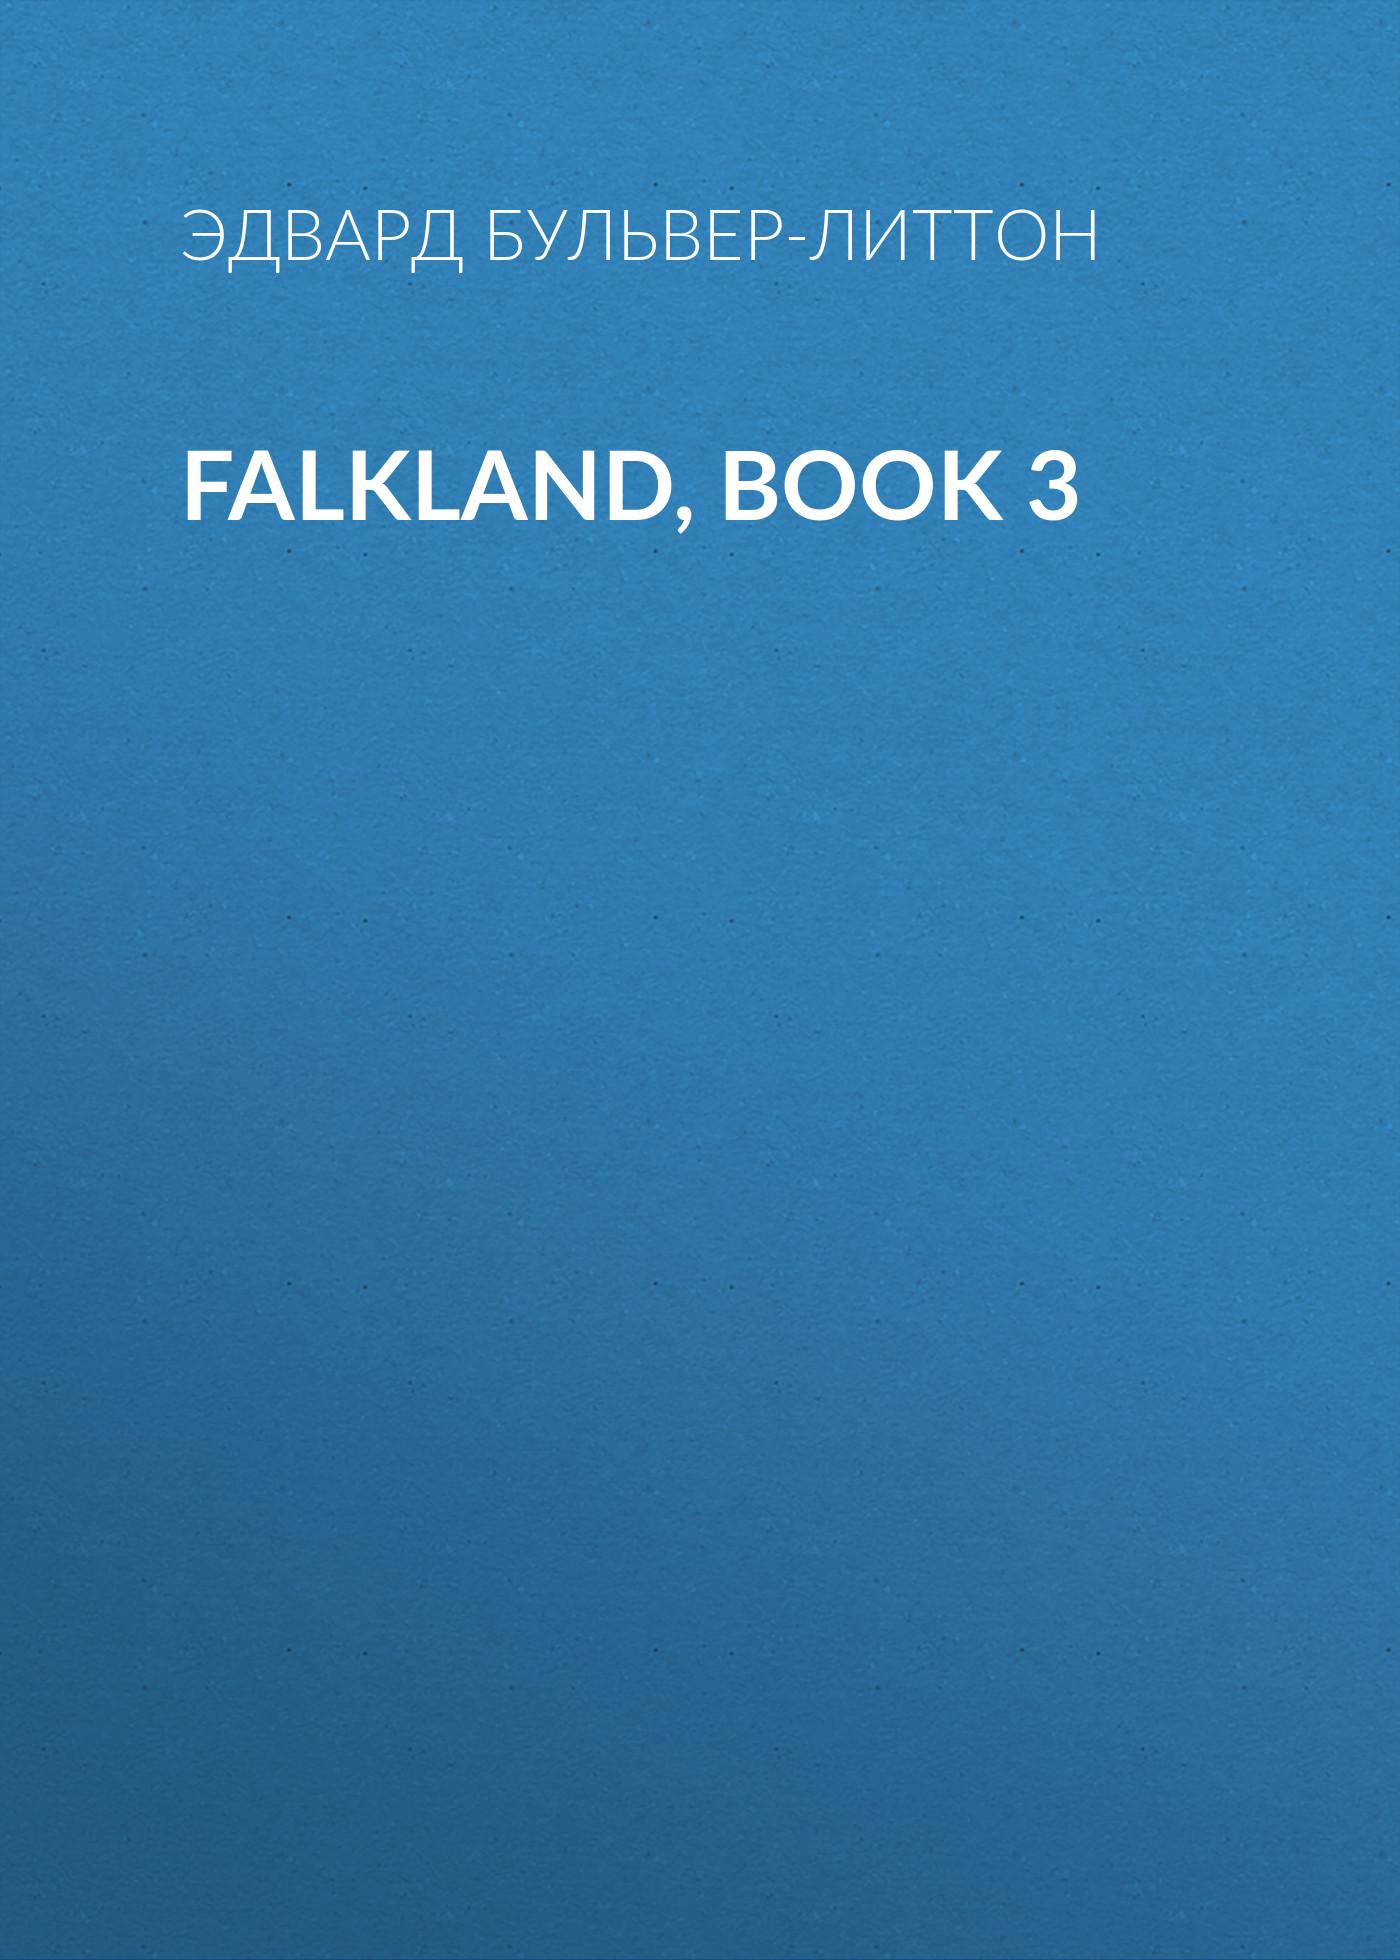 Эдвард Бульвер-Литтон Falkland, Book 3 эдвард бульвер литтон пелэм или приключения джентльмена